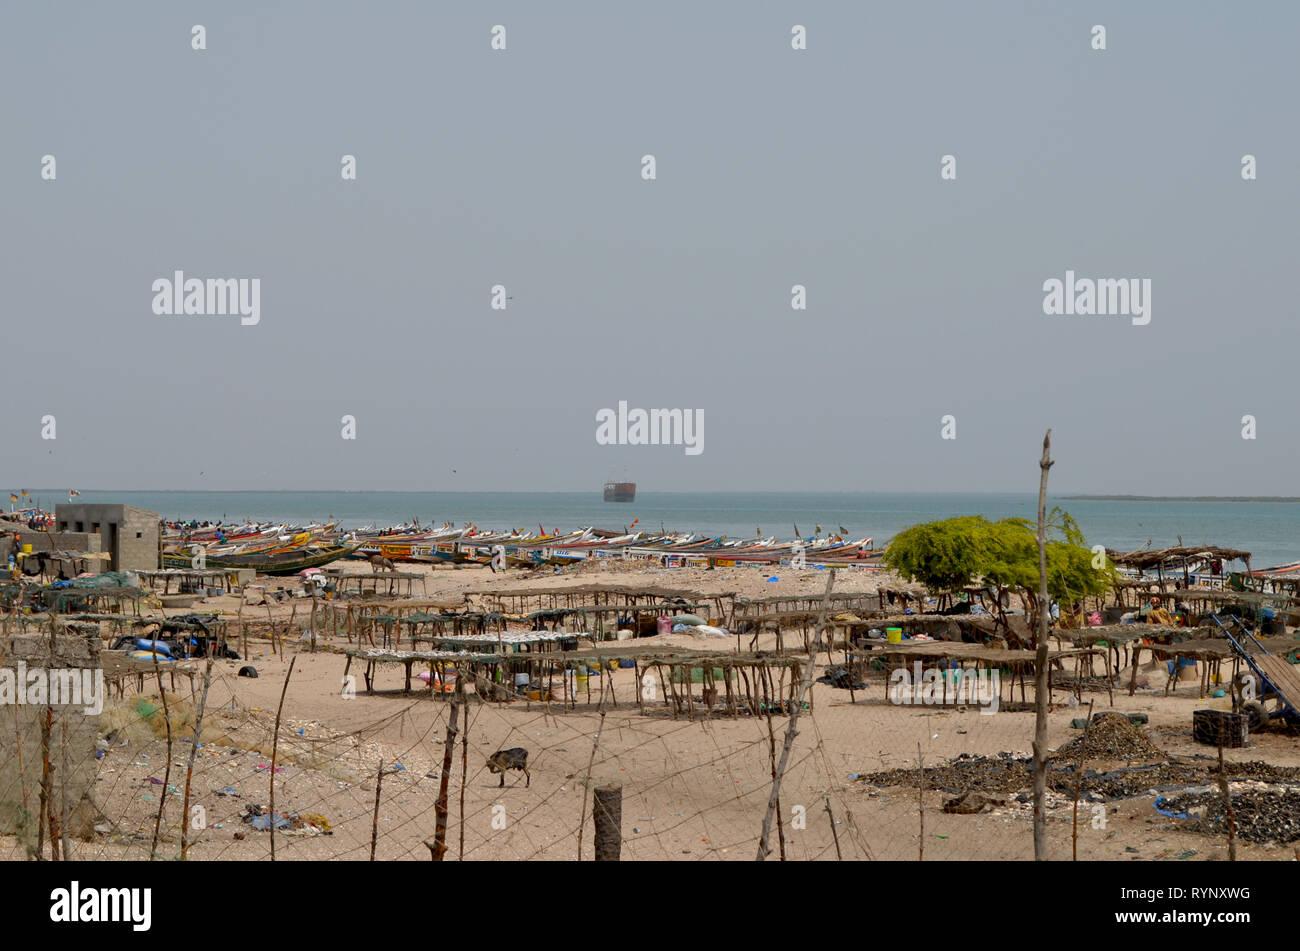 Sardinella landing and drying areas in the coastal village of Djiffère, Senegal Stock Photo